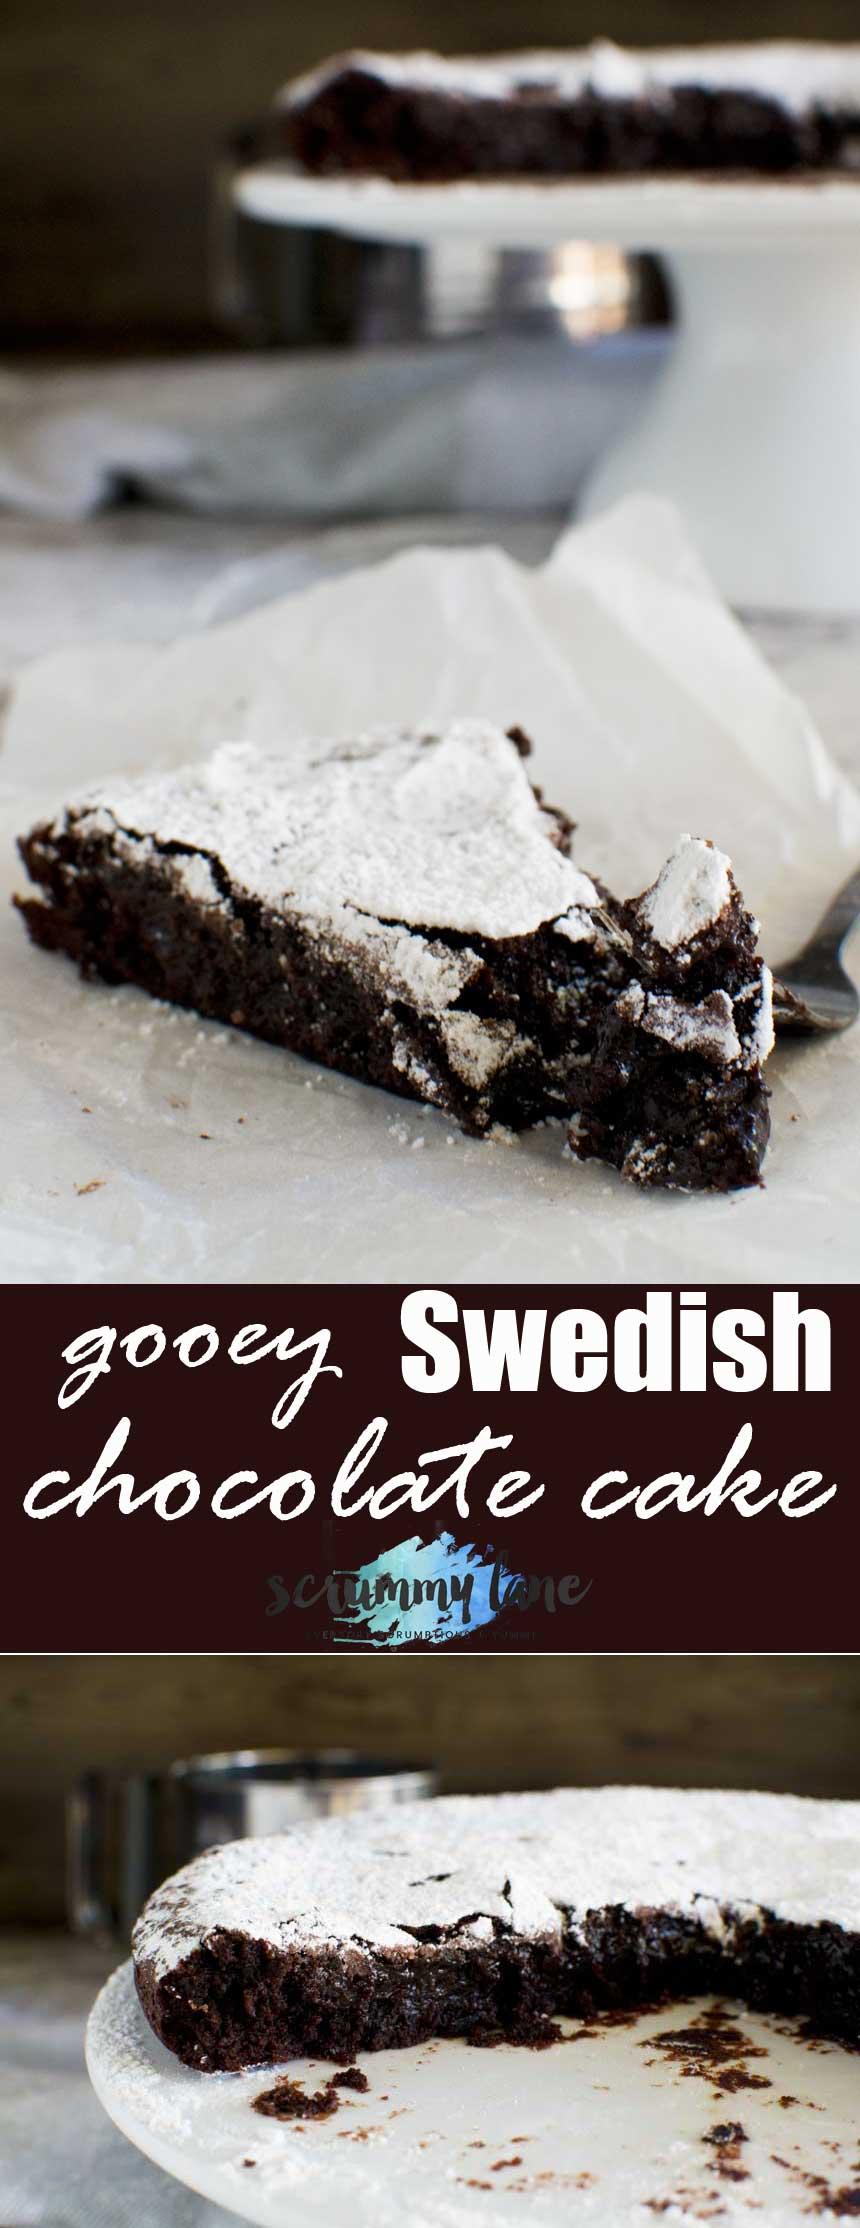 6 Ingredient Gooey Swedish Chocolate Cake Kladdkaka